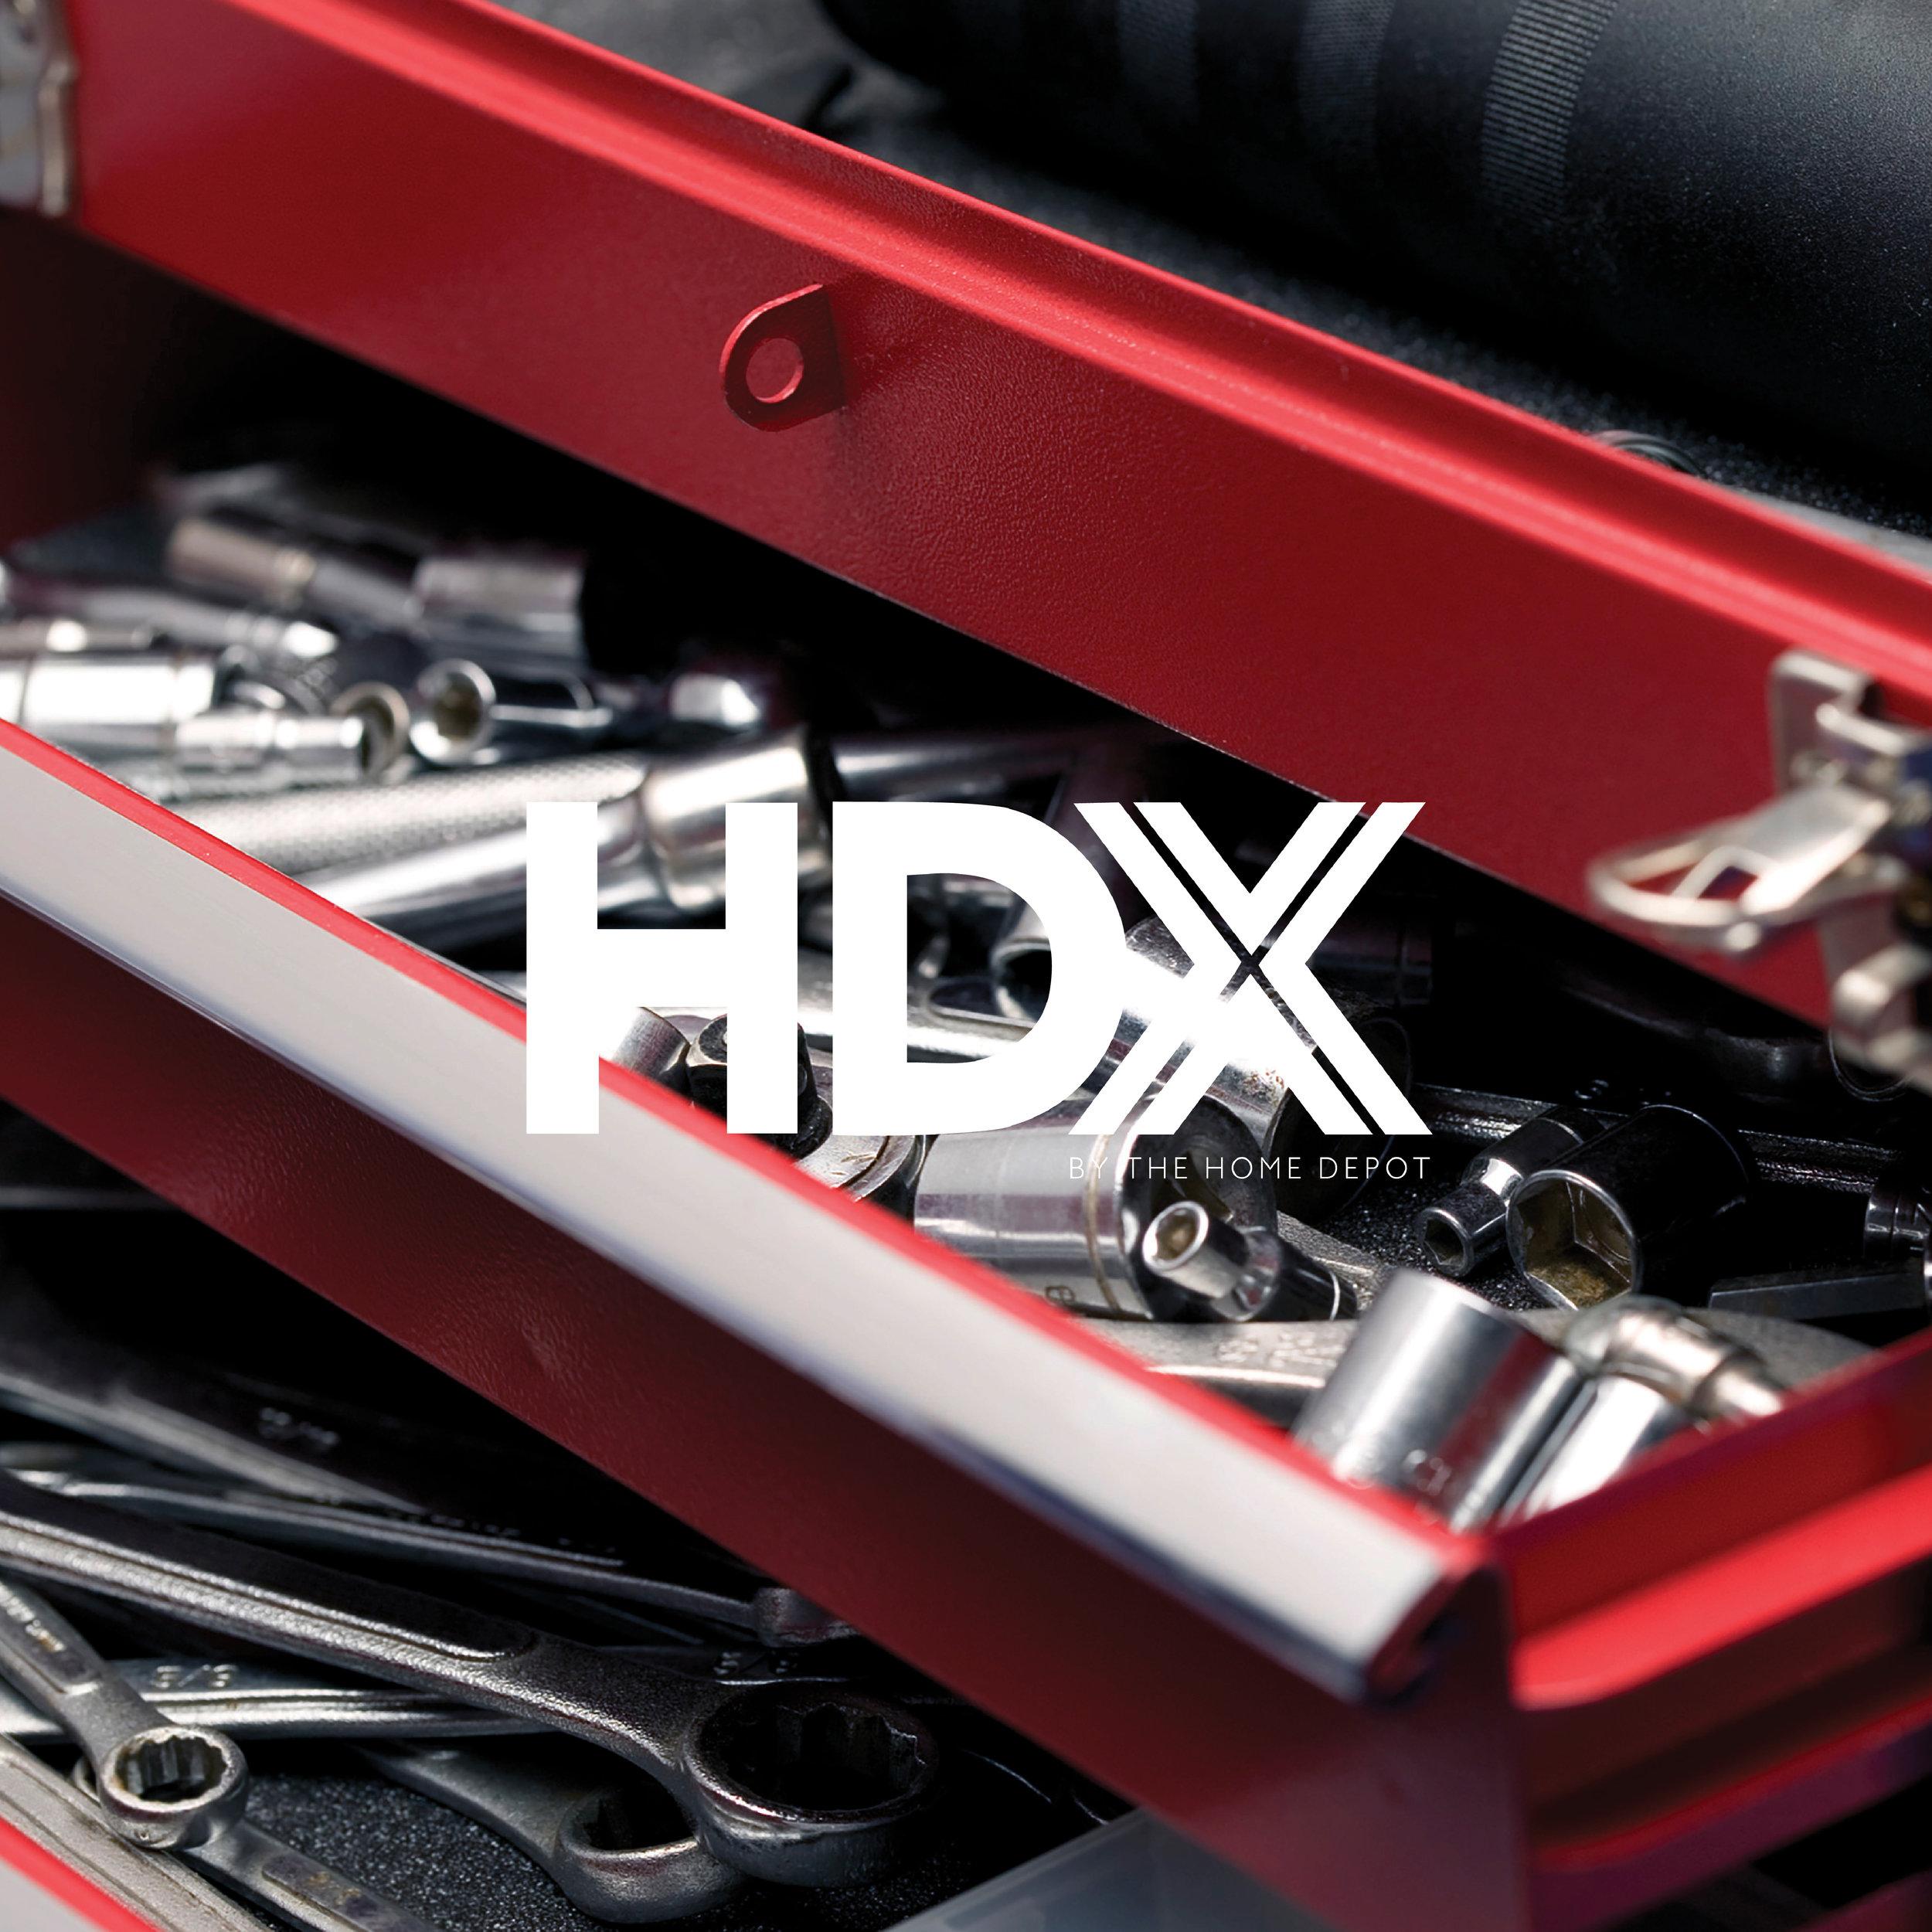 HDX (The Home Depot)